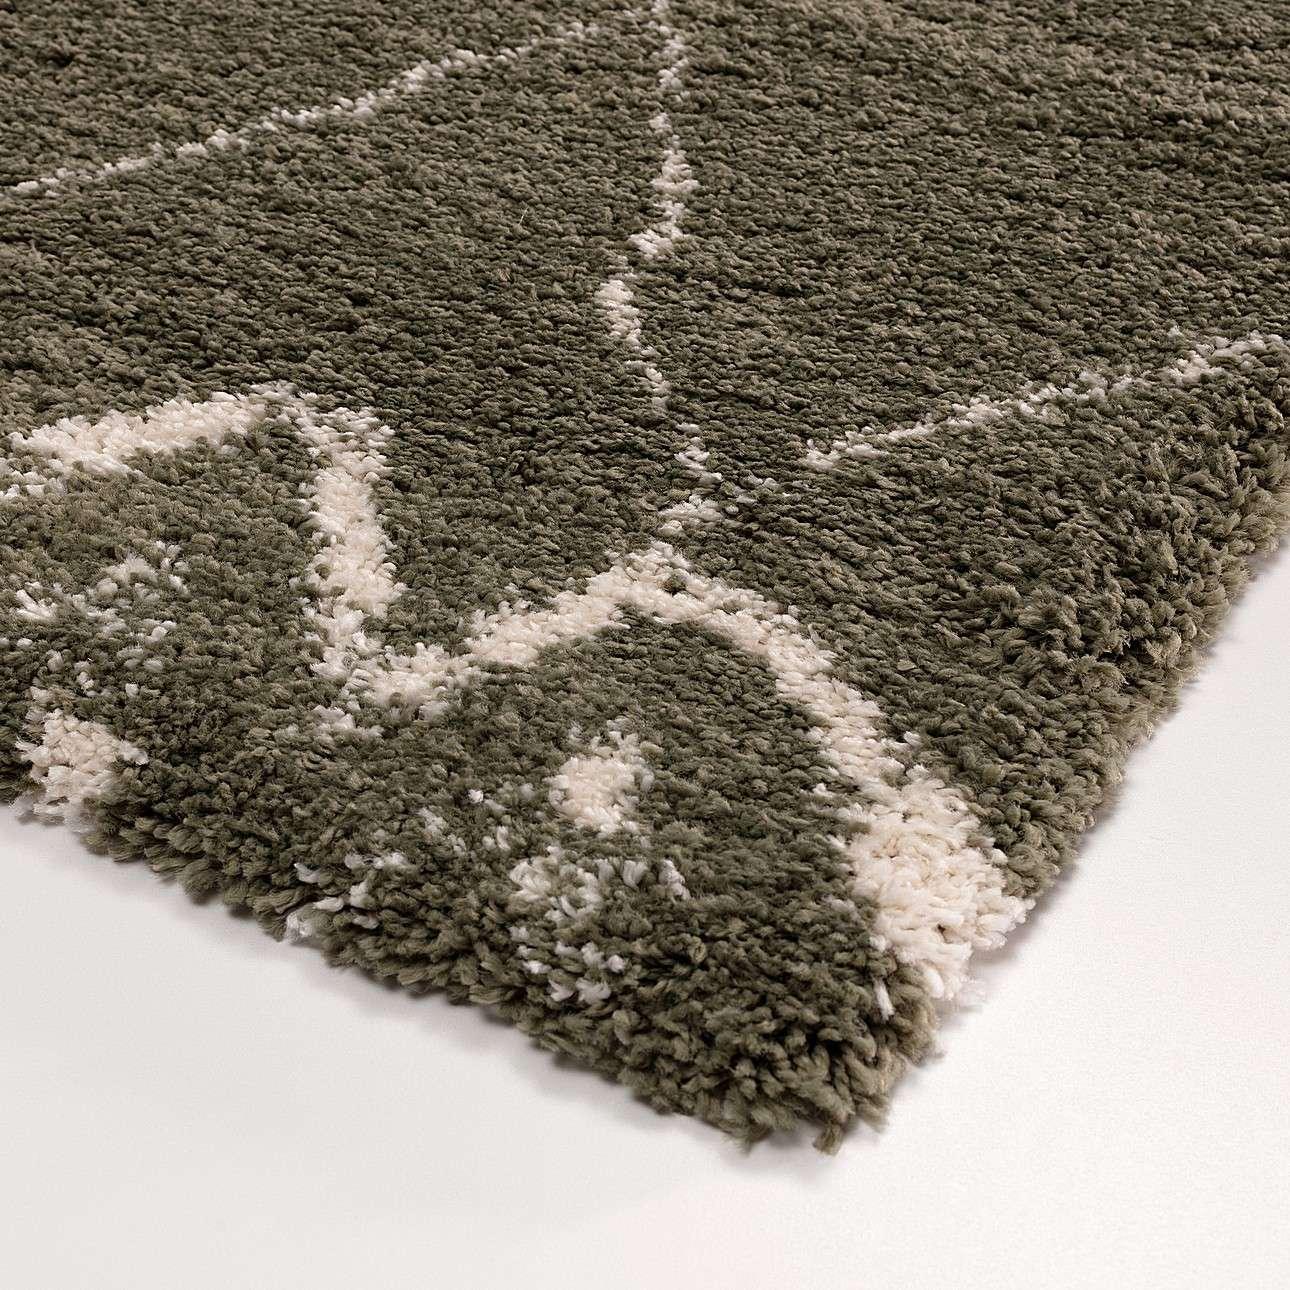 Teppich Royal Willow green/cream 120x170cm